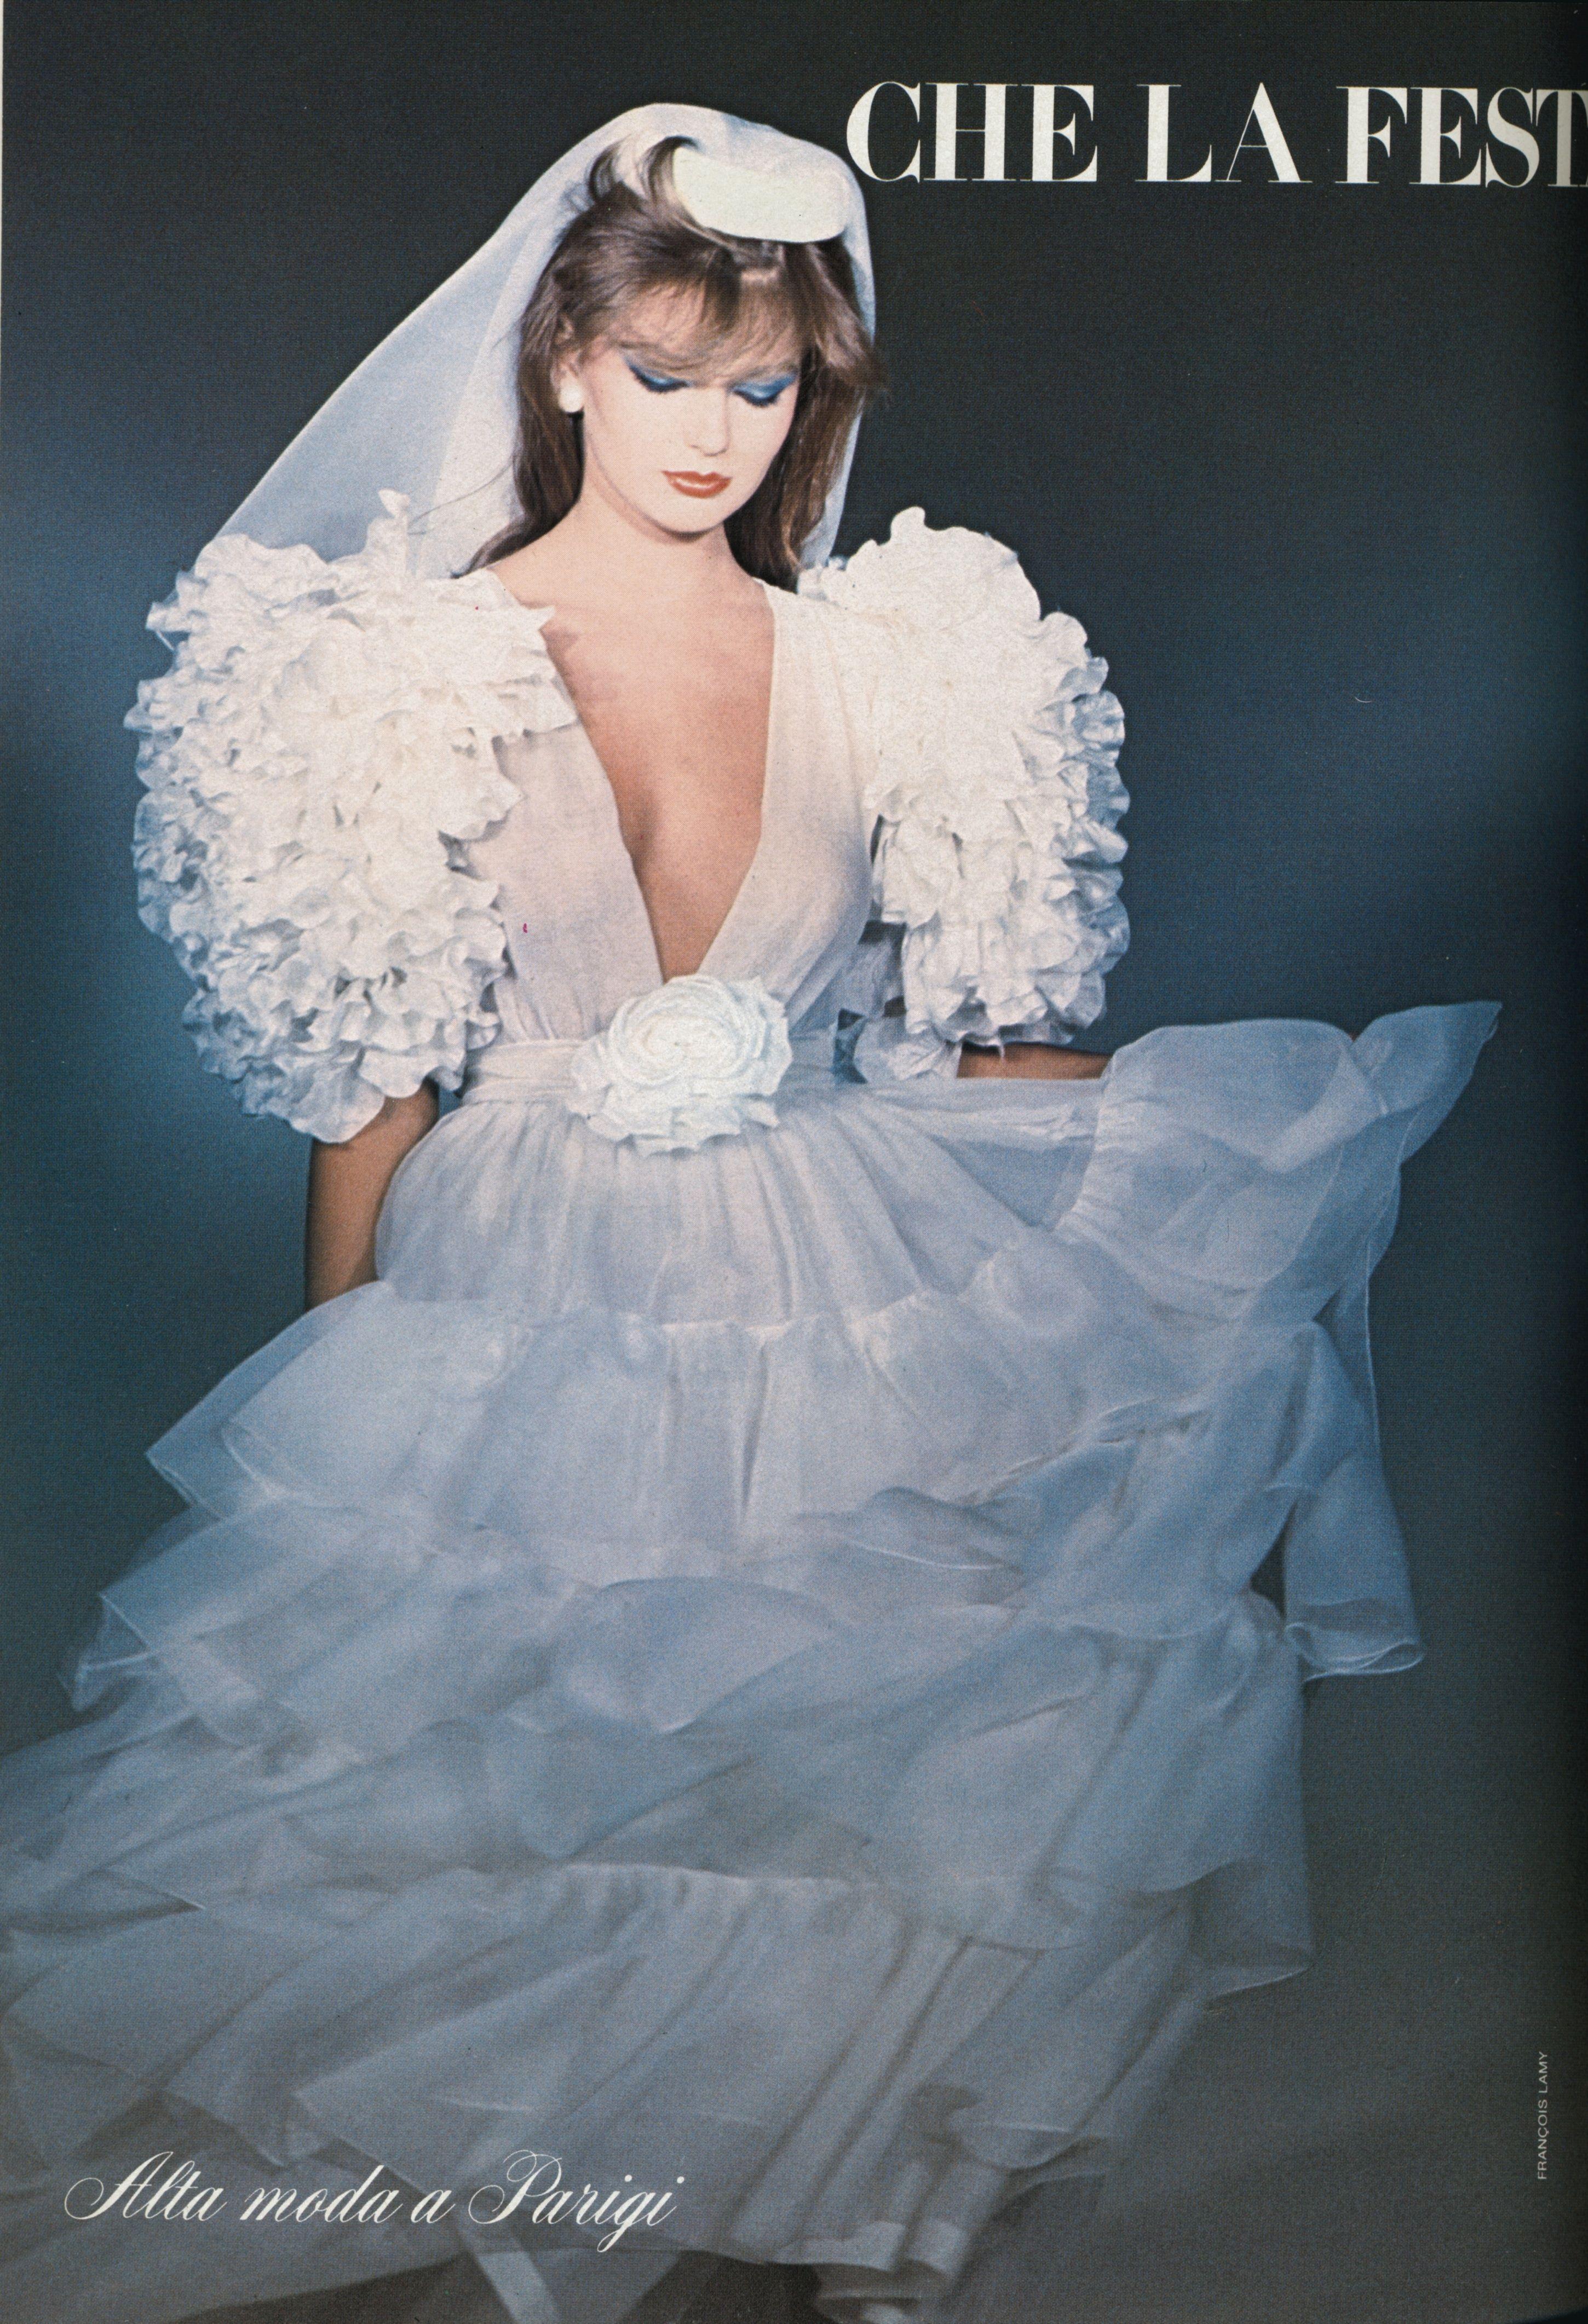 Vogue Italy Sposa June 1982 wedding dresses history